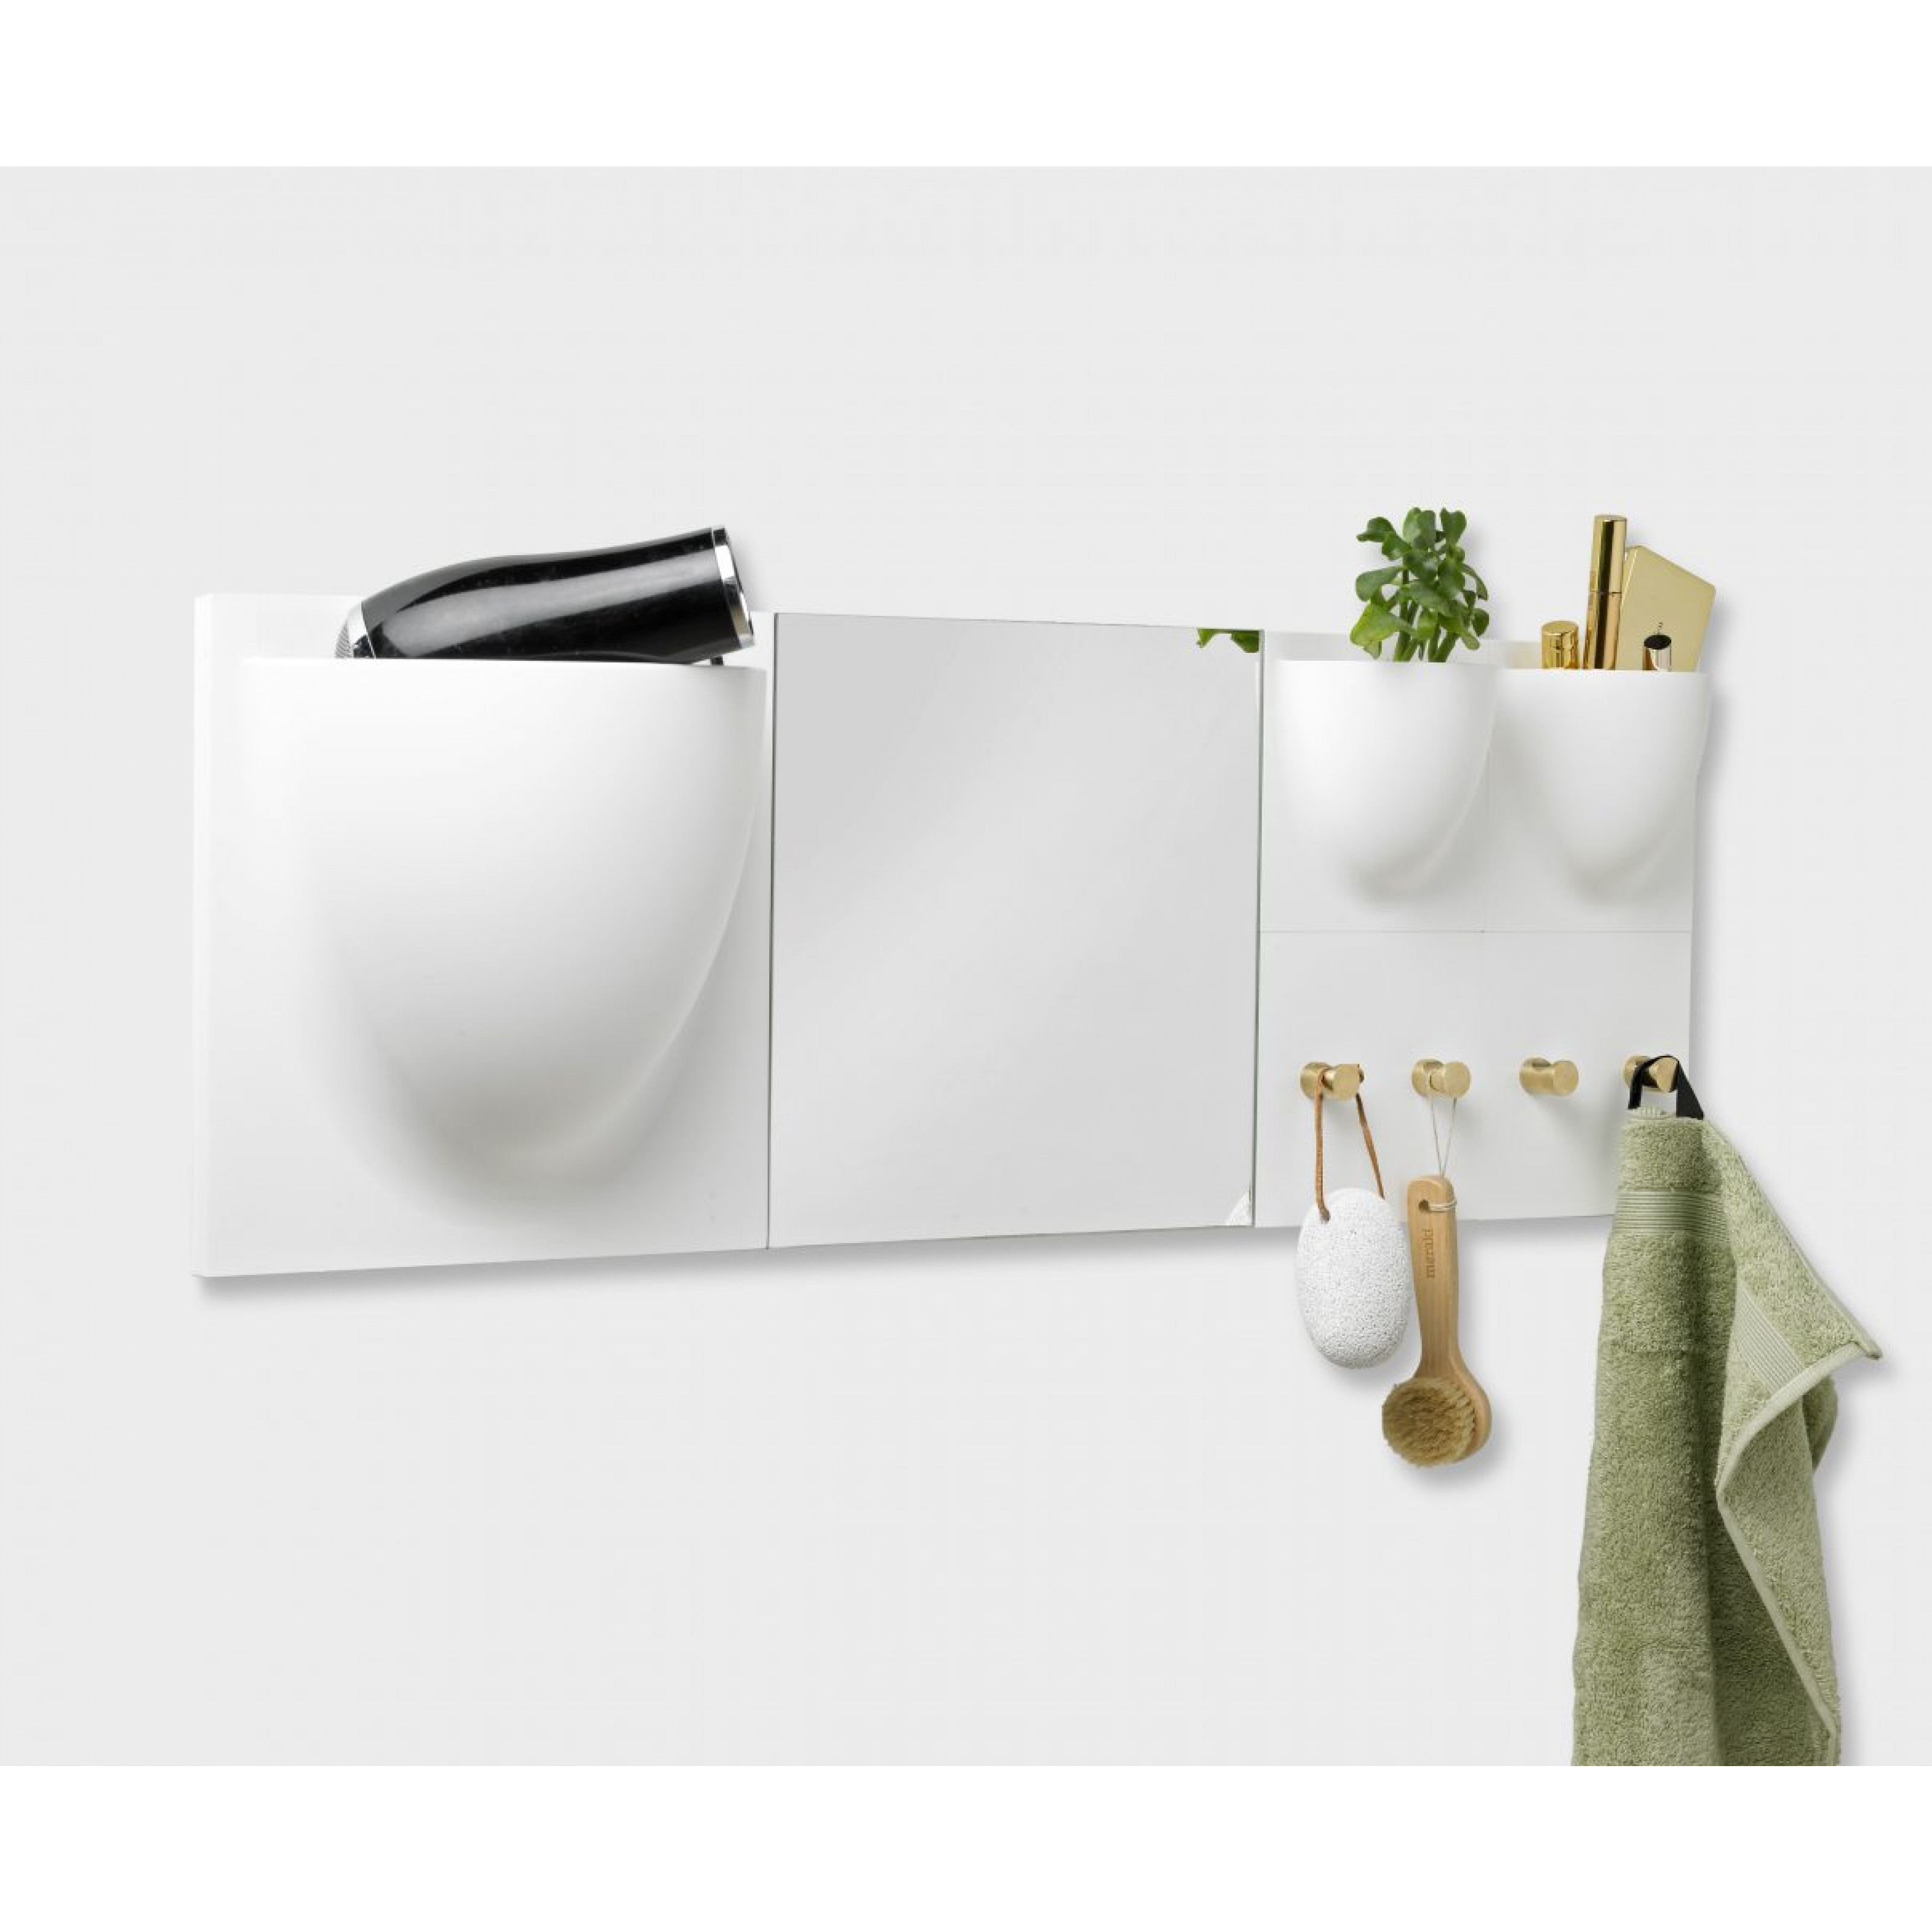 Haken VertiHooks   Weiß & Messing